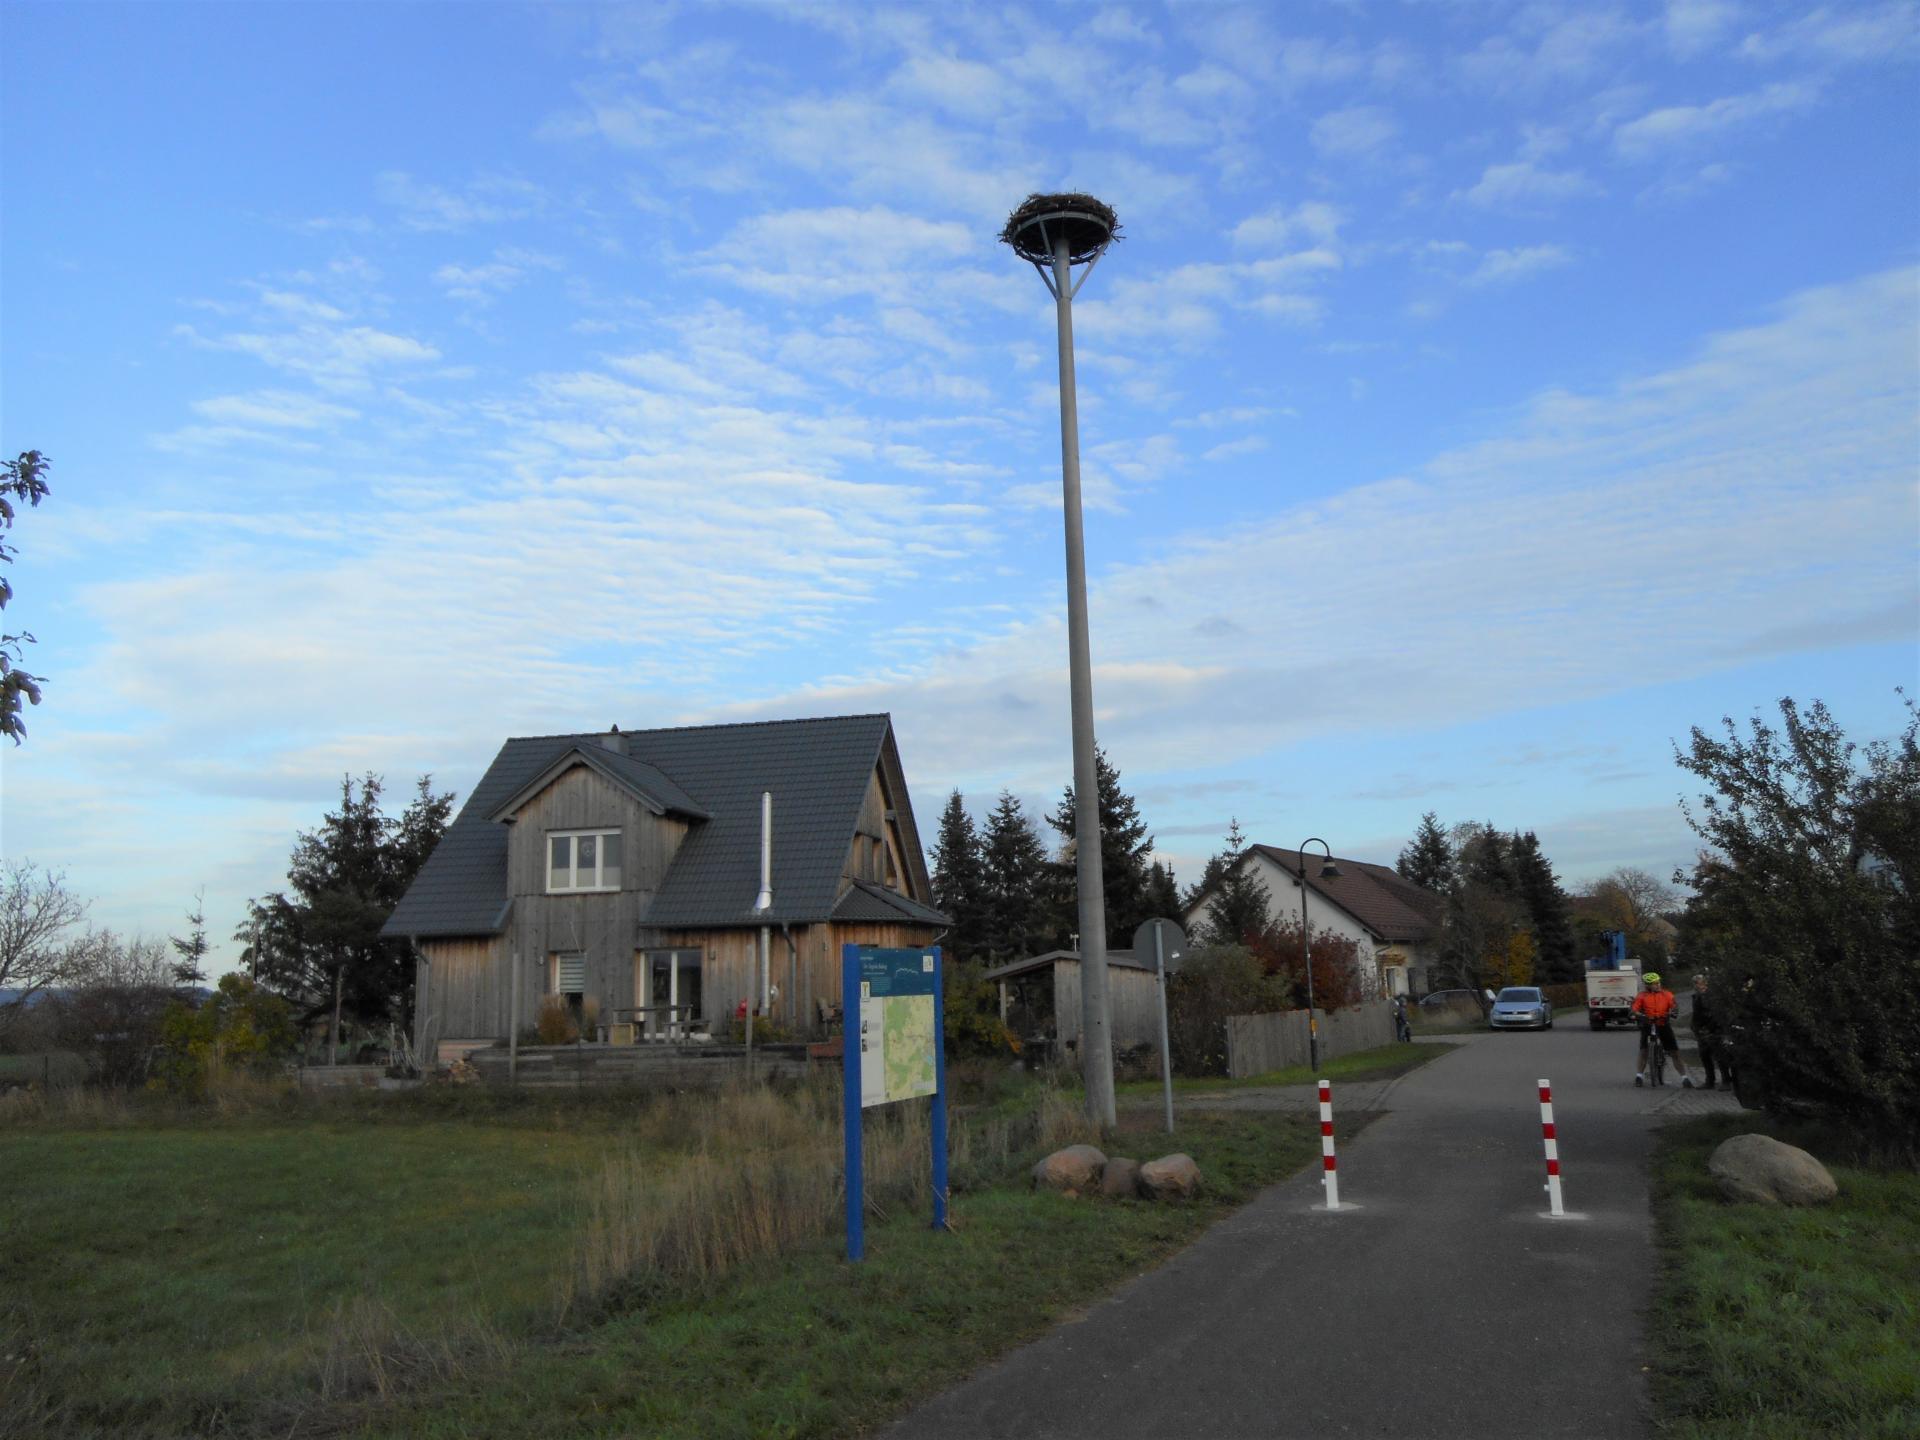 2020-11-03_Storchenhorst-Zinna-06